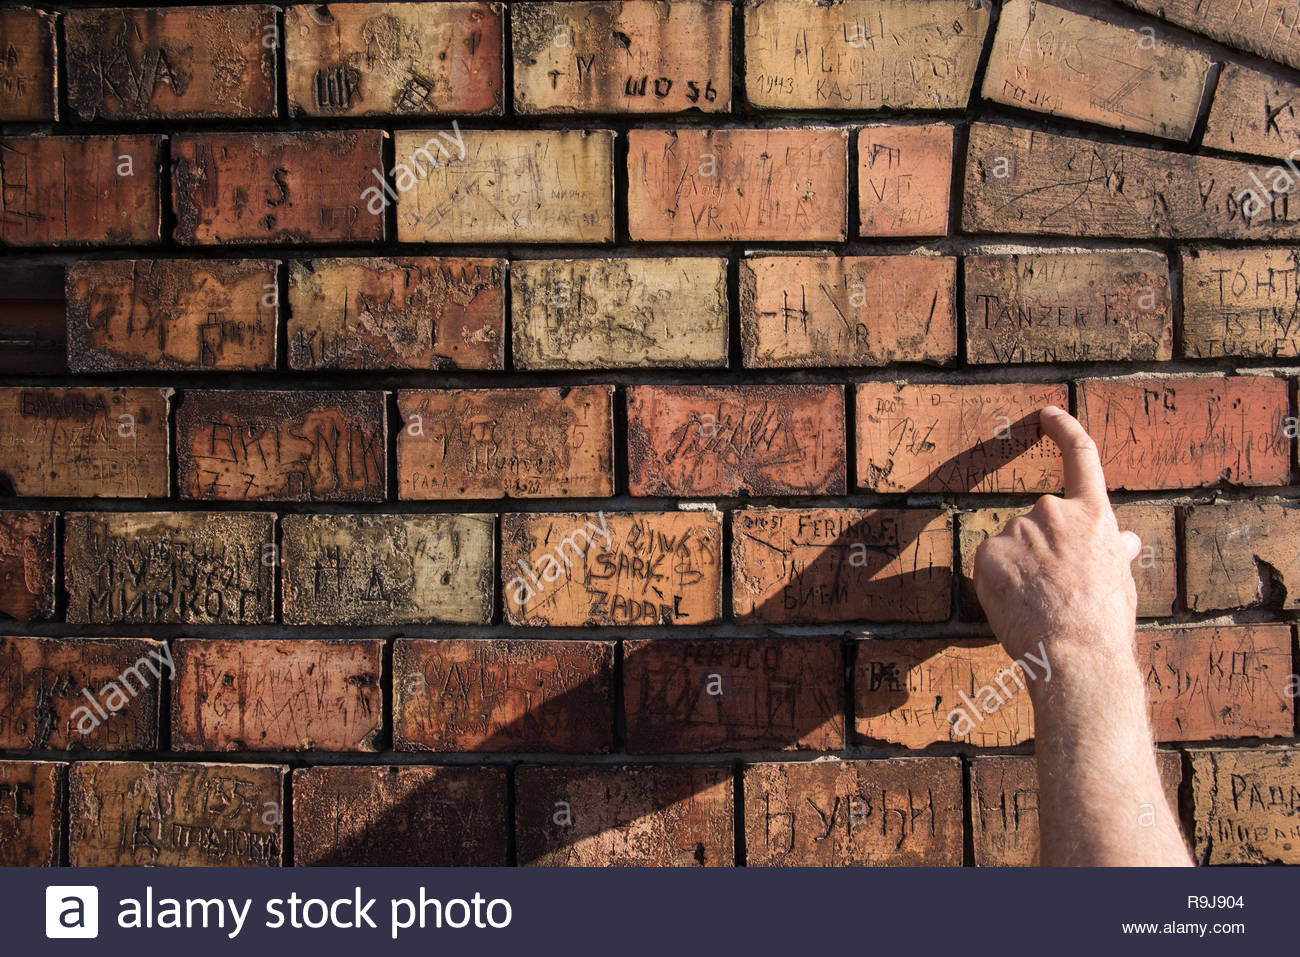 Bricks on wall with graffiti, Zemun, Belgrade, Serbia - Stock Image